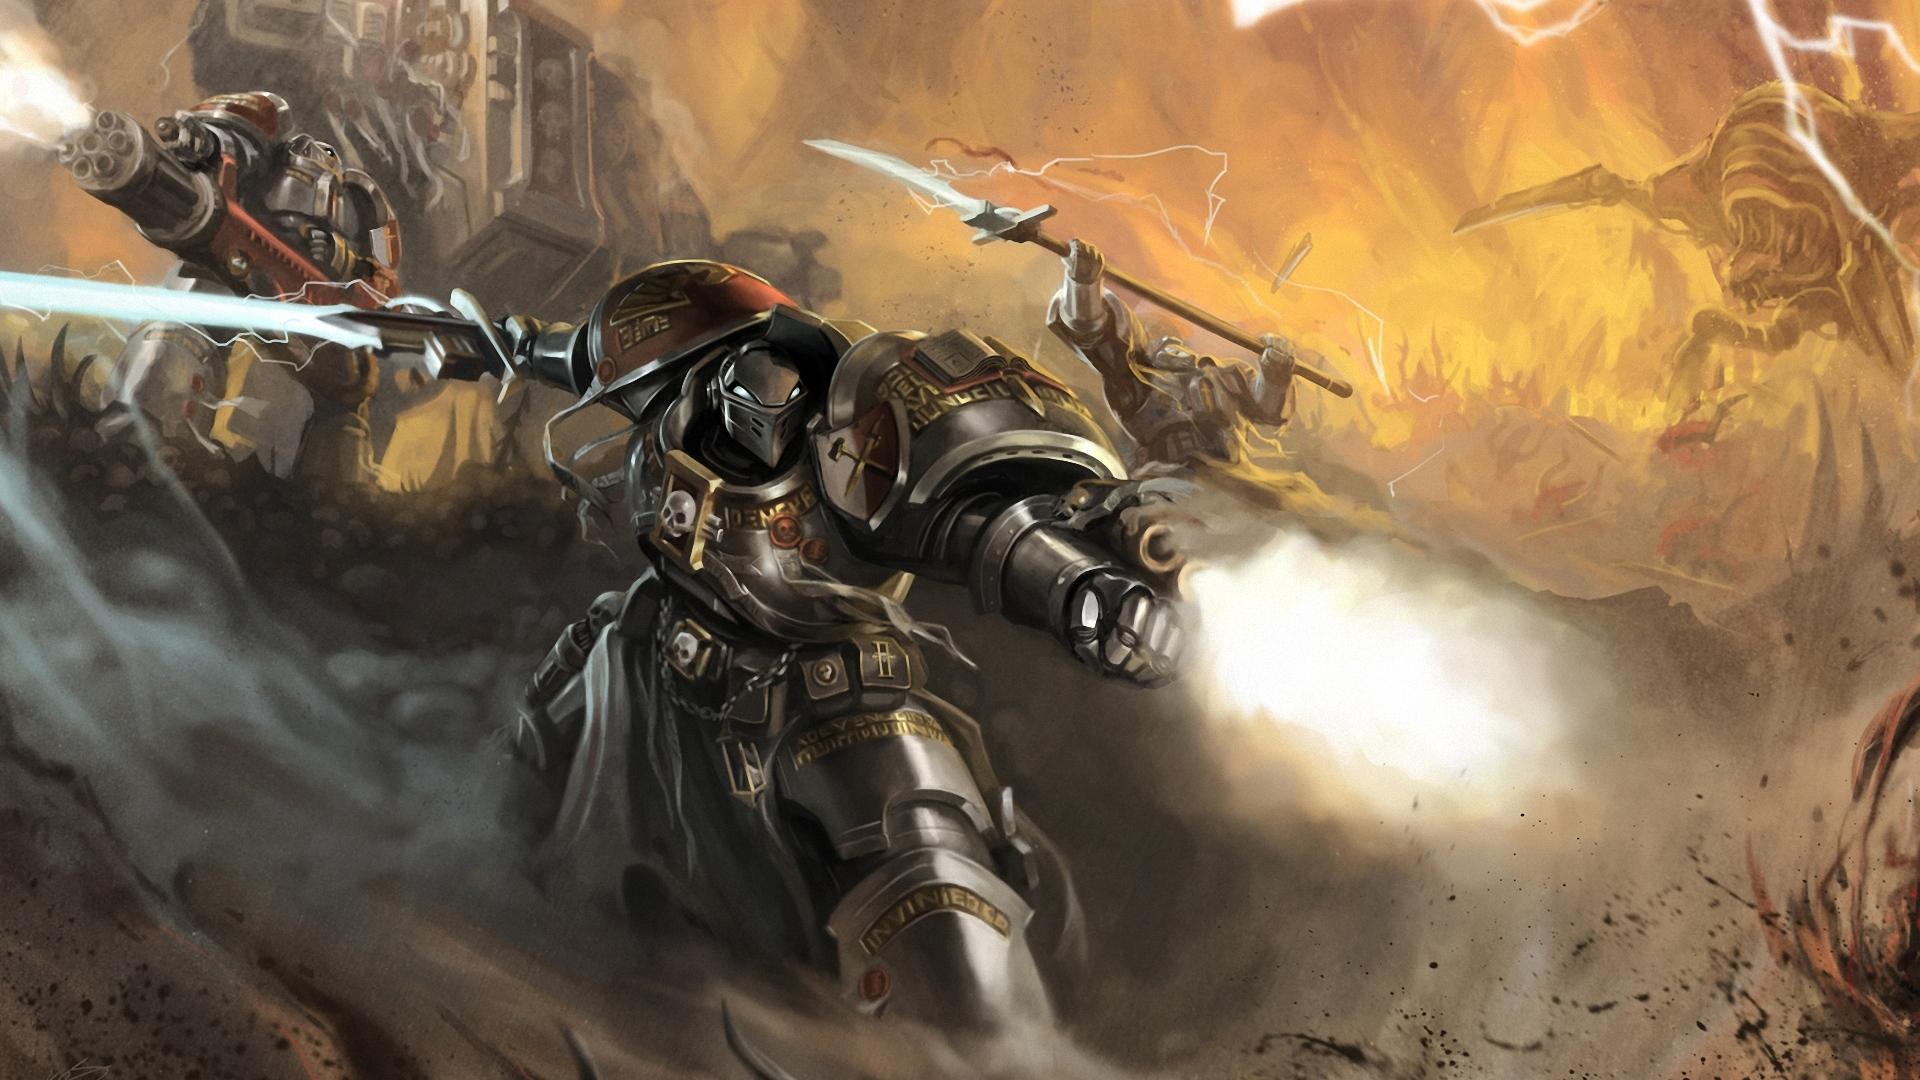 warhammer 40k wallpaper 1920x1080 - photo #29